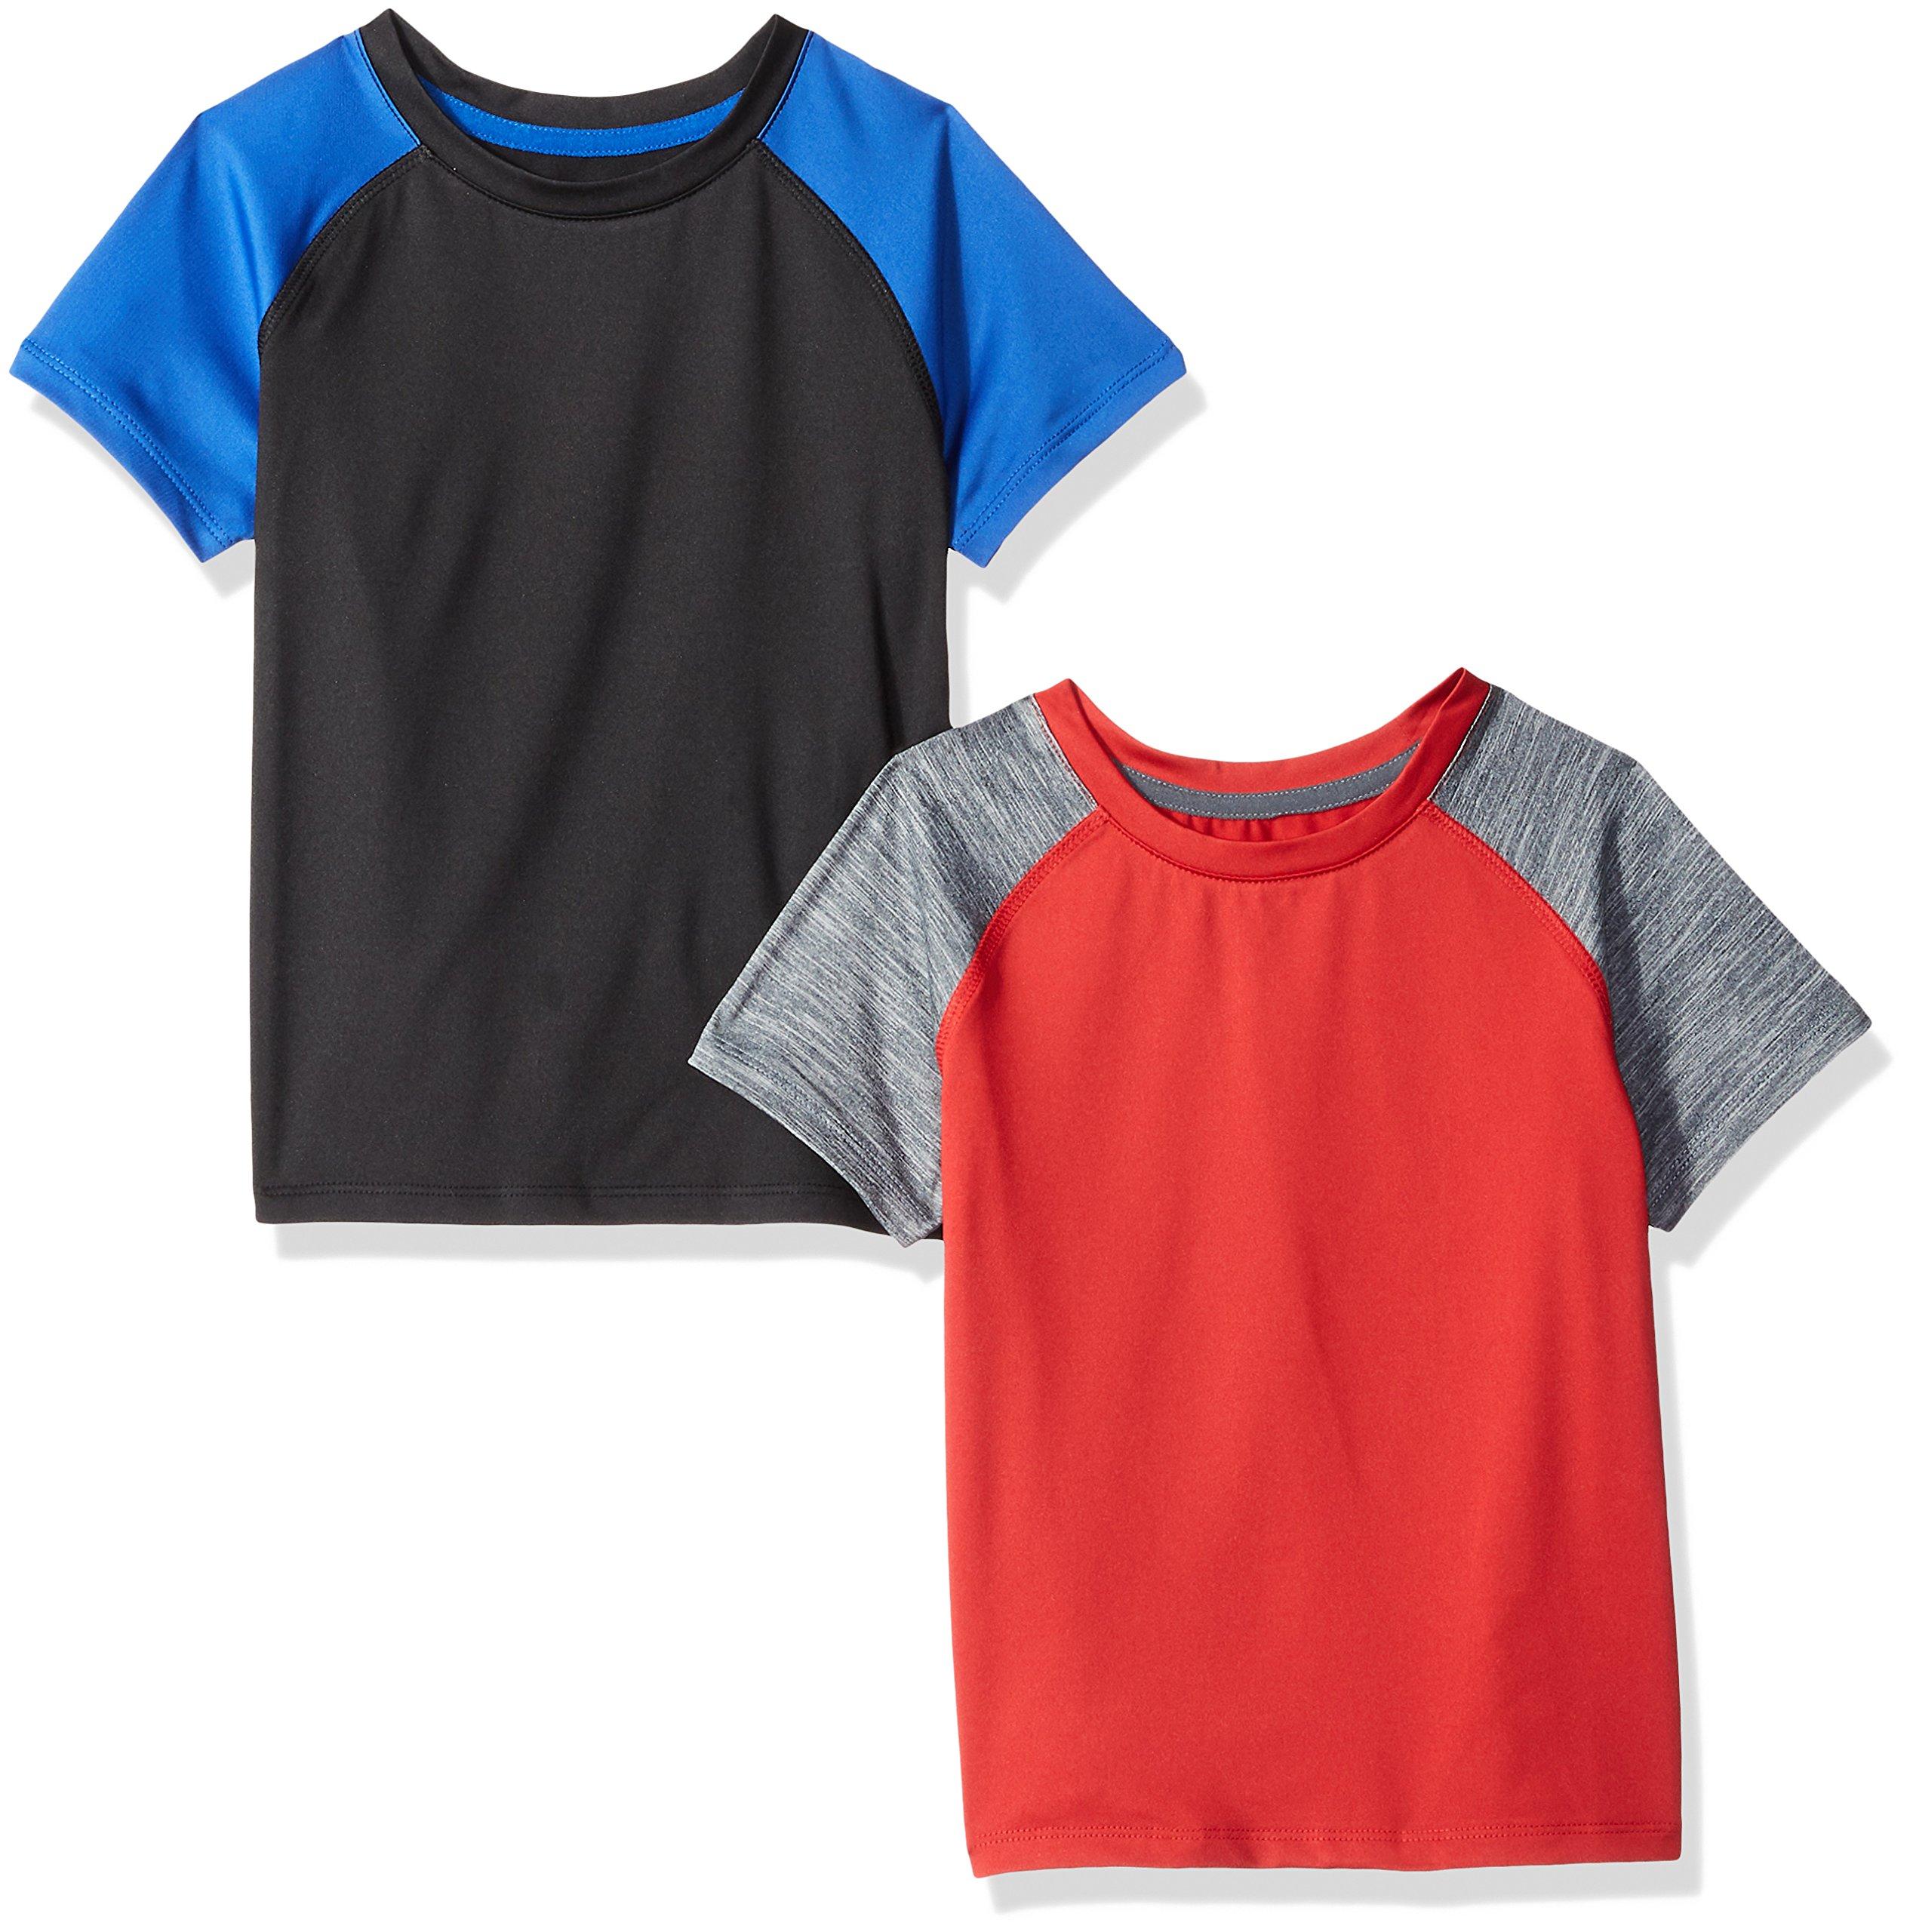 Amazon Essentials Toddler Boys' 2-Pack Short-Sleeve Raglan Active Tee, Black/Royal Blue/Grey/Red, 3T